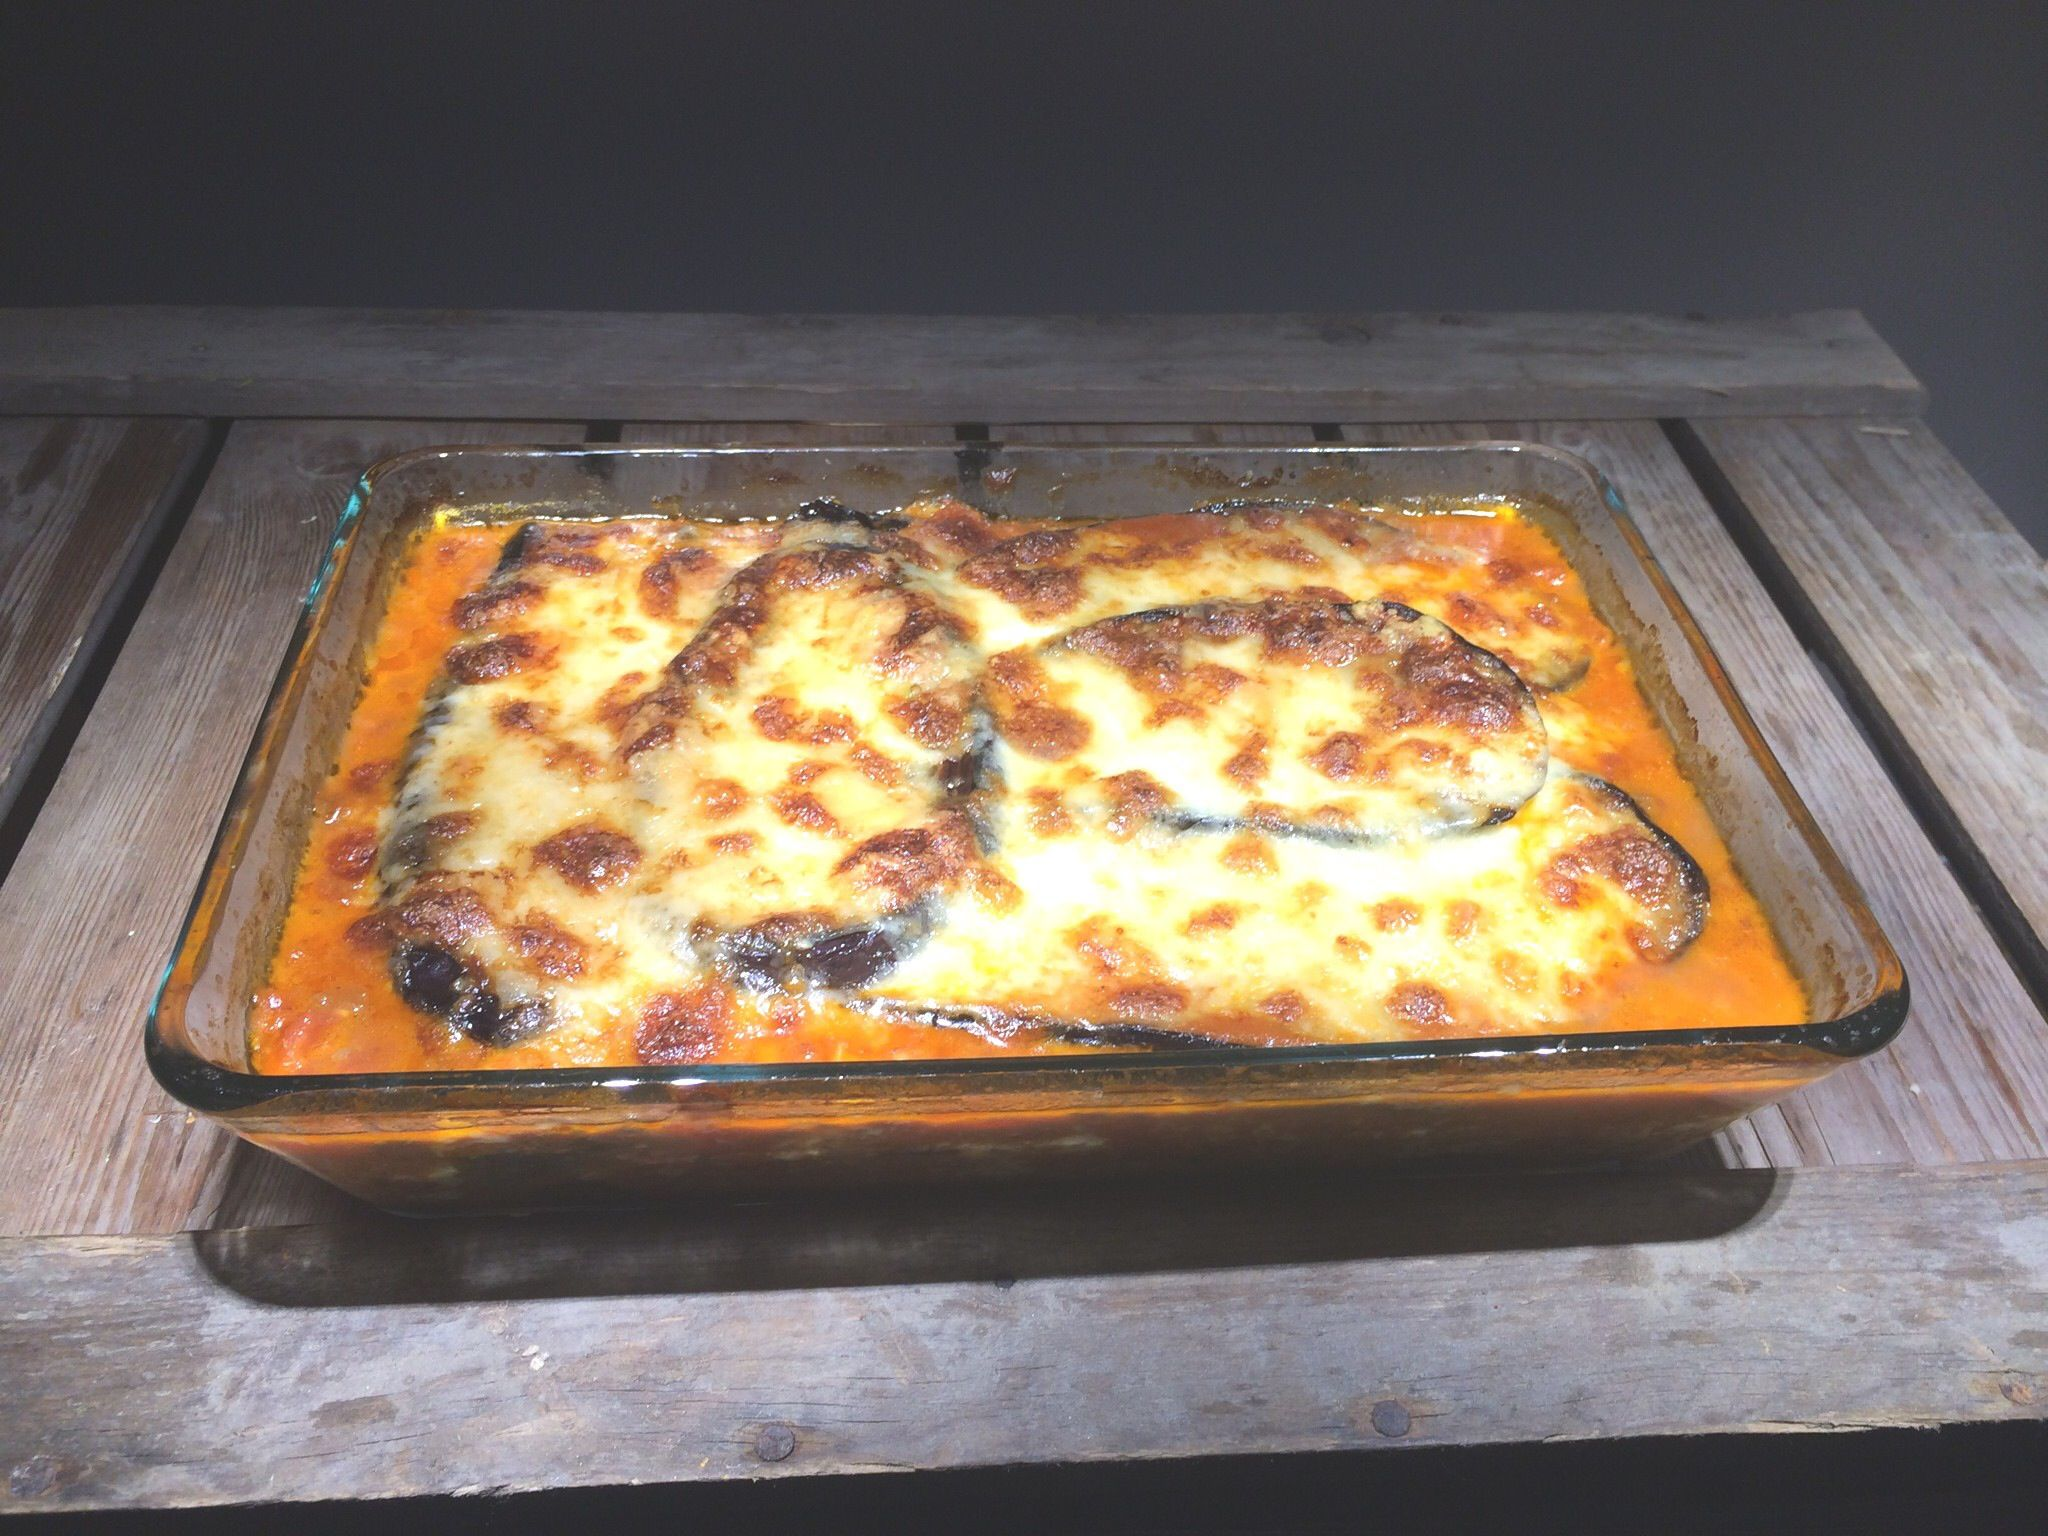 Auberginelasagne zonder deeg - slechts groenten, kruiden en verse mozzarella.  http://myflavourites.nl/auberginelasagne/